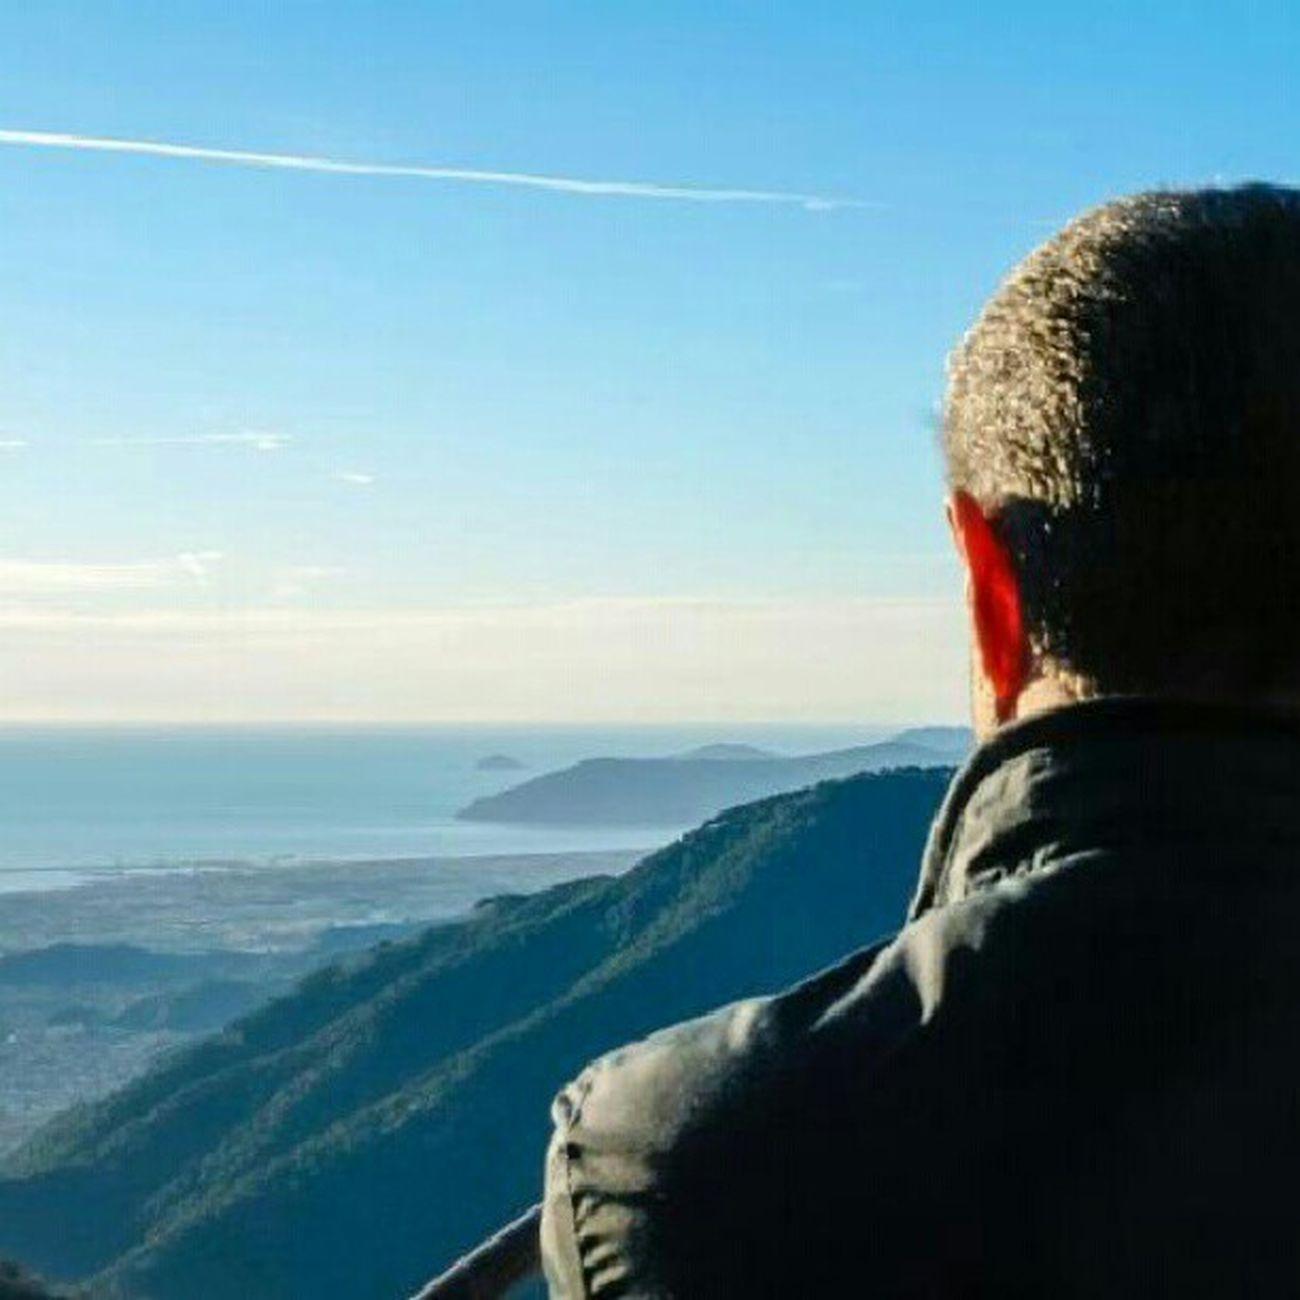 Guardare See Horizon Orizzonte sea mare massa toscana tuscany sky cielo blue blu infinity infinito